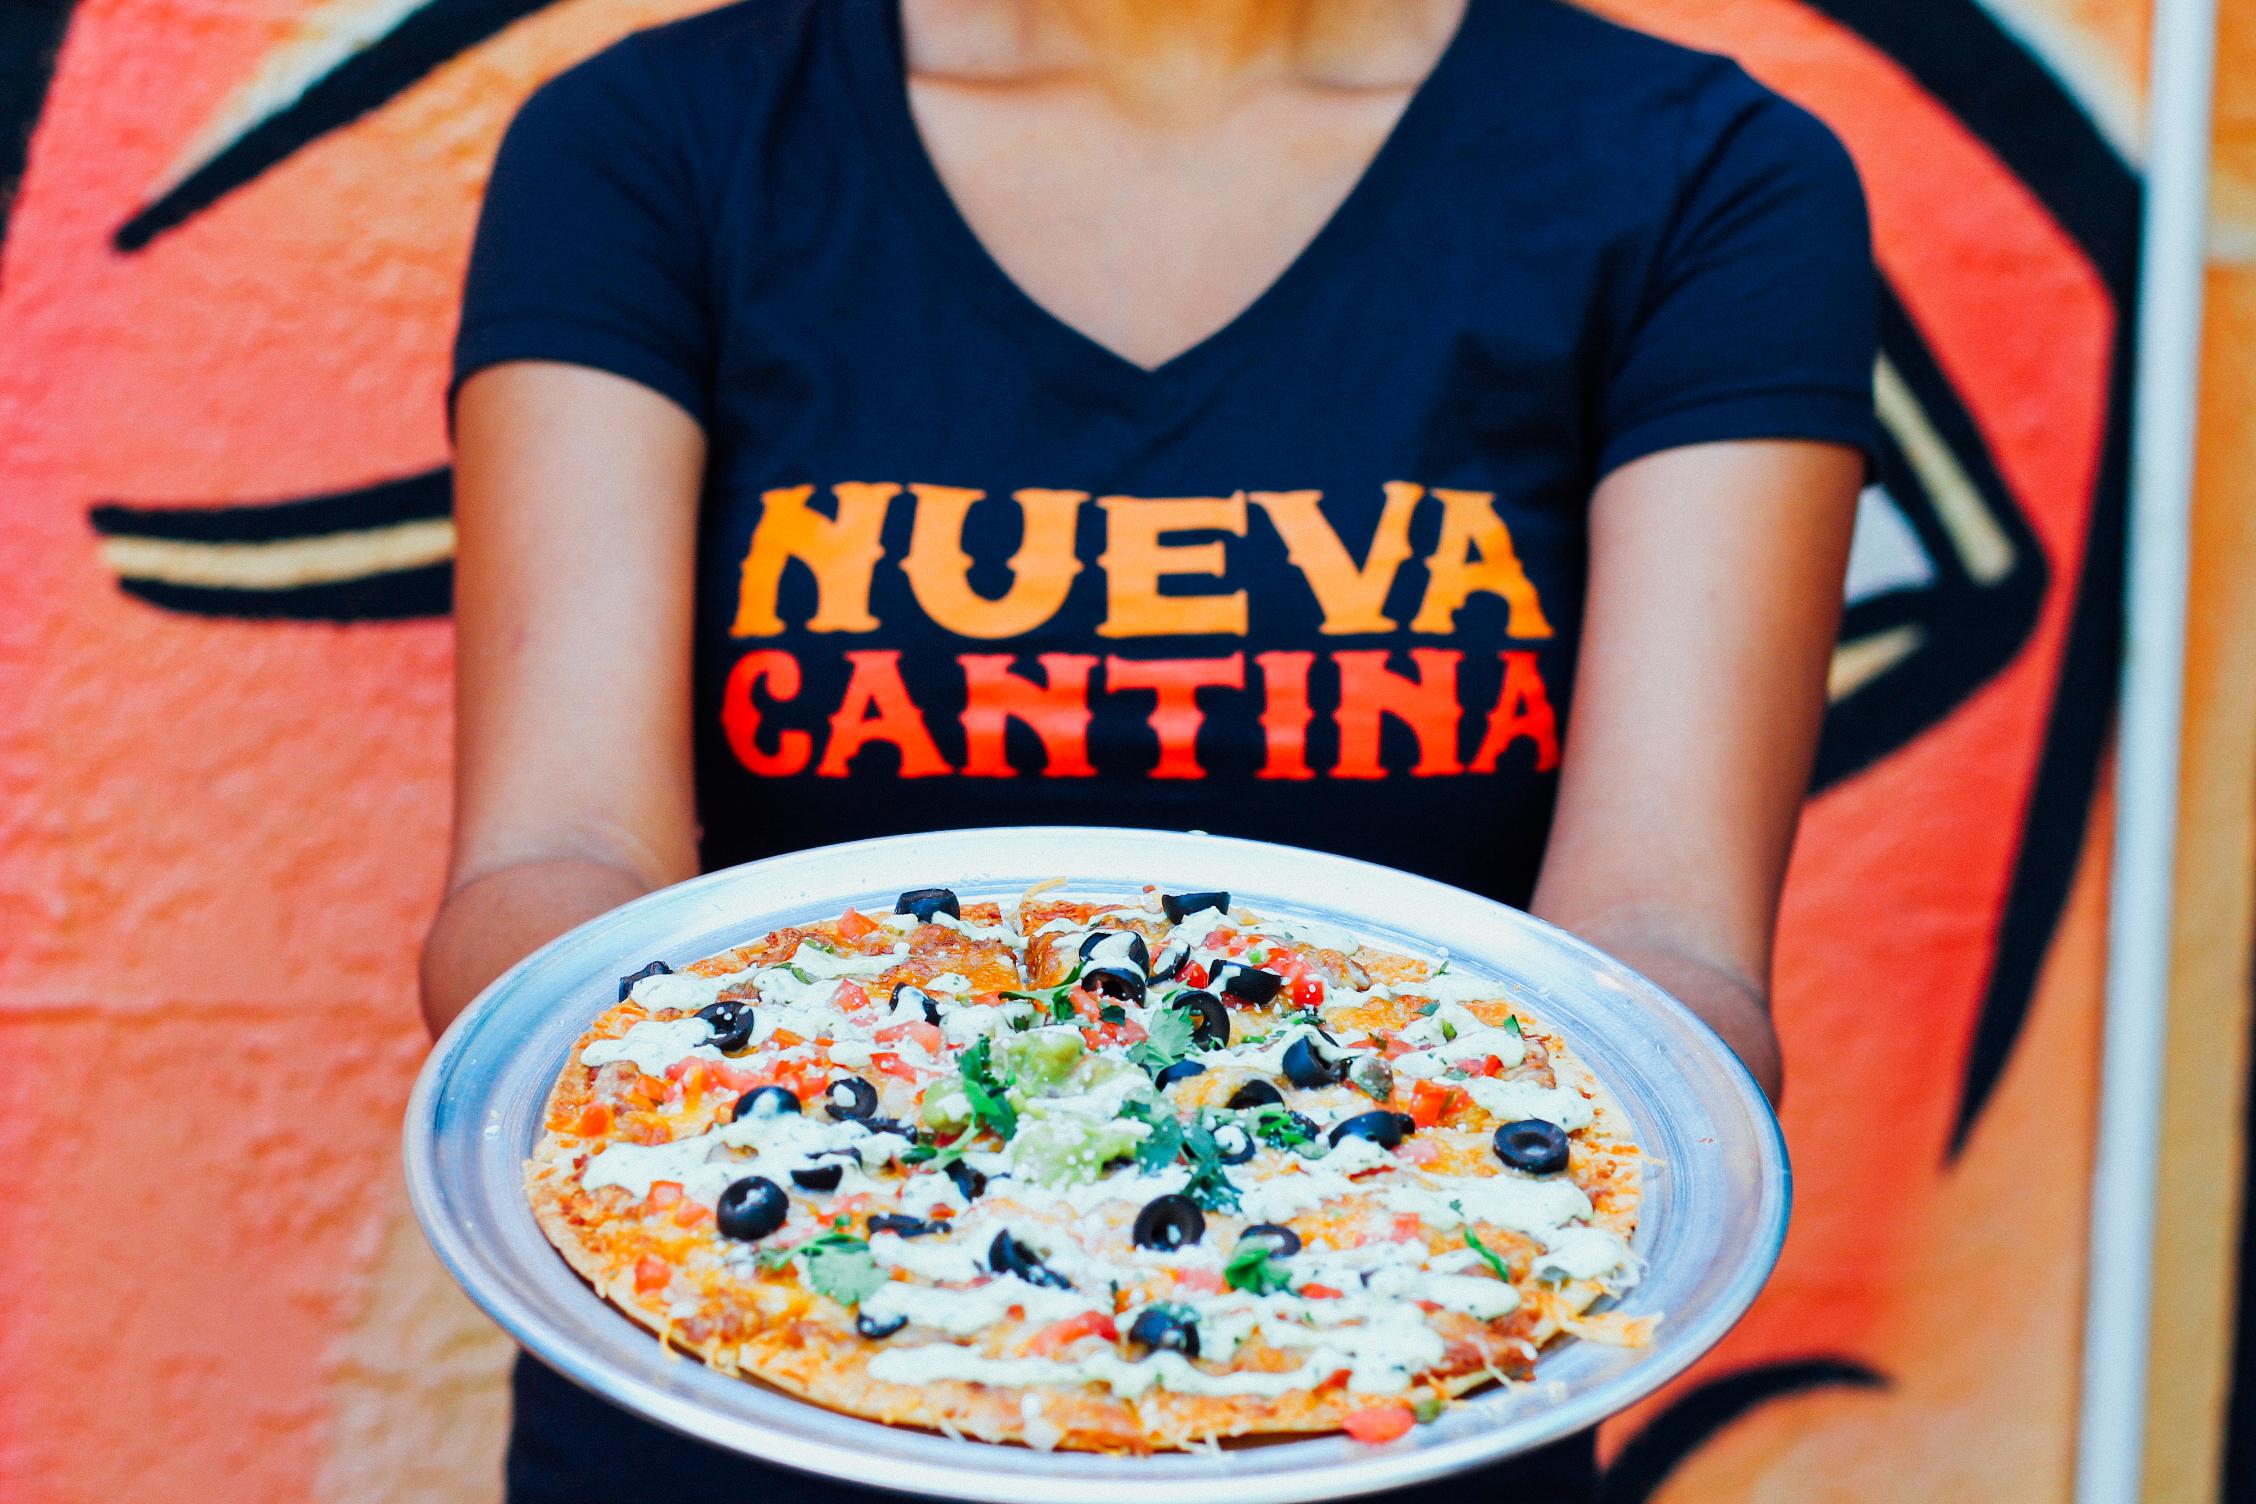 Nueva Cantina Brings the Tastes of Guadalajara to the Sunshine City with Birria Tacos